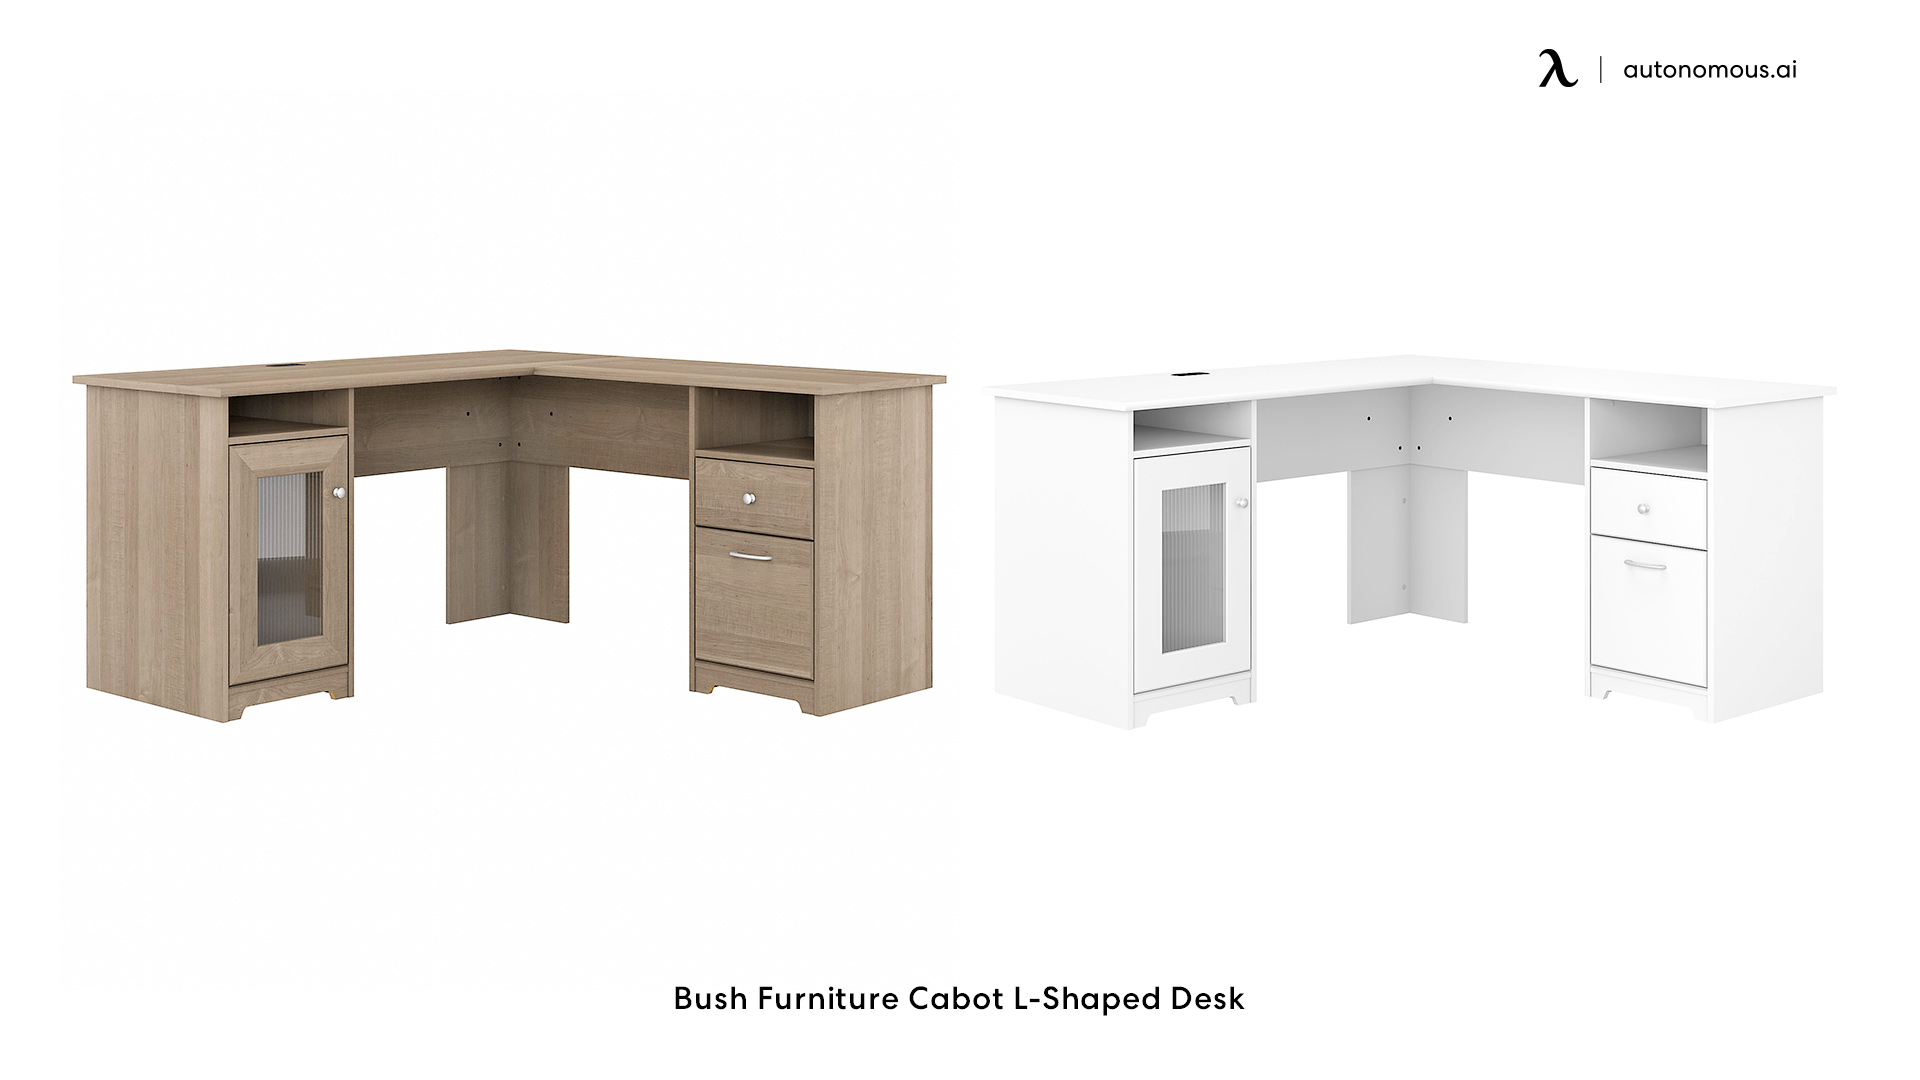 Bush Furniture L-shaped Cabot Computer Desk